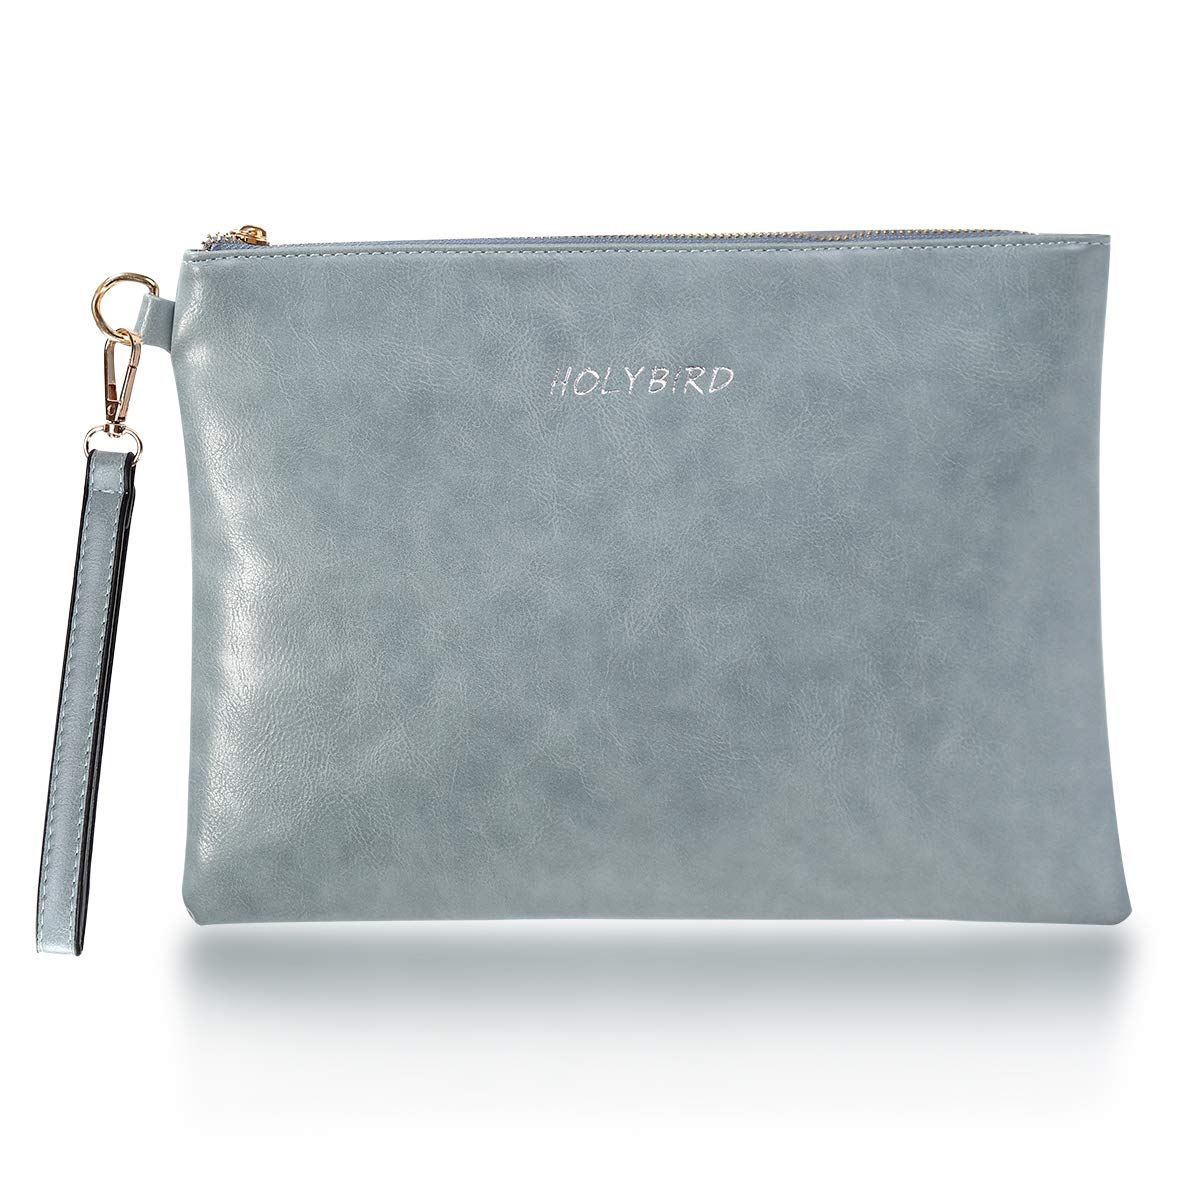 Women's PU Wristlet Wallet Purse Big Clutch Handbag with Zipper Ball Party Bag for Girl Grey by HOLYBIRD (Image #1)